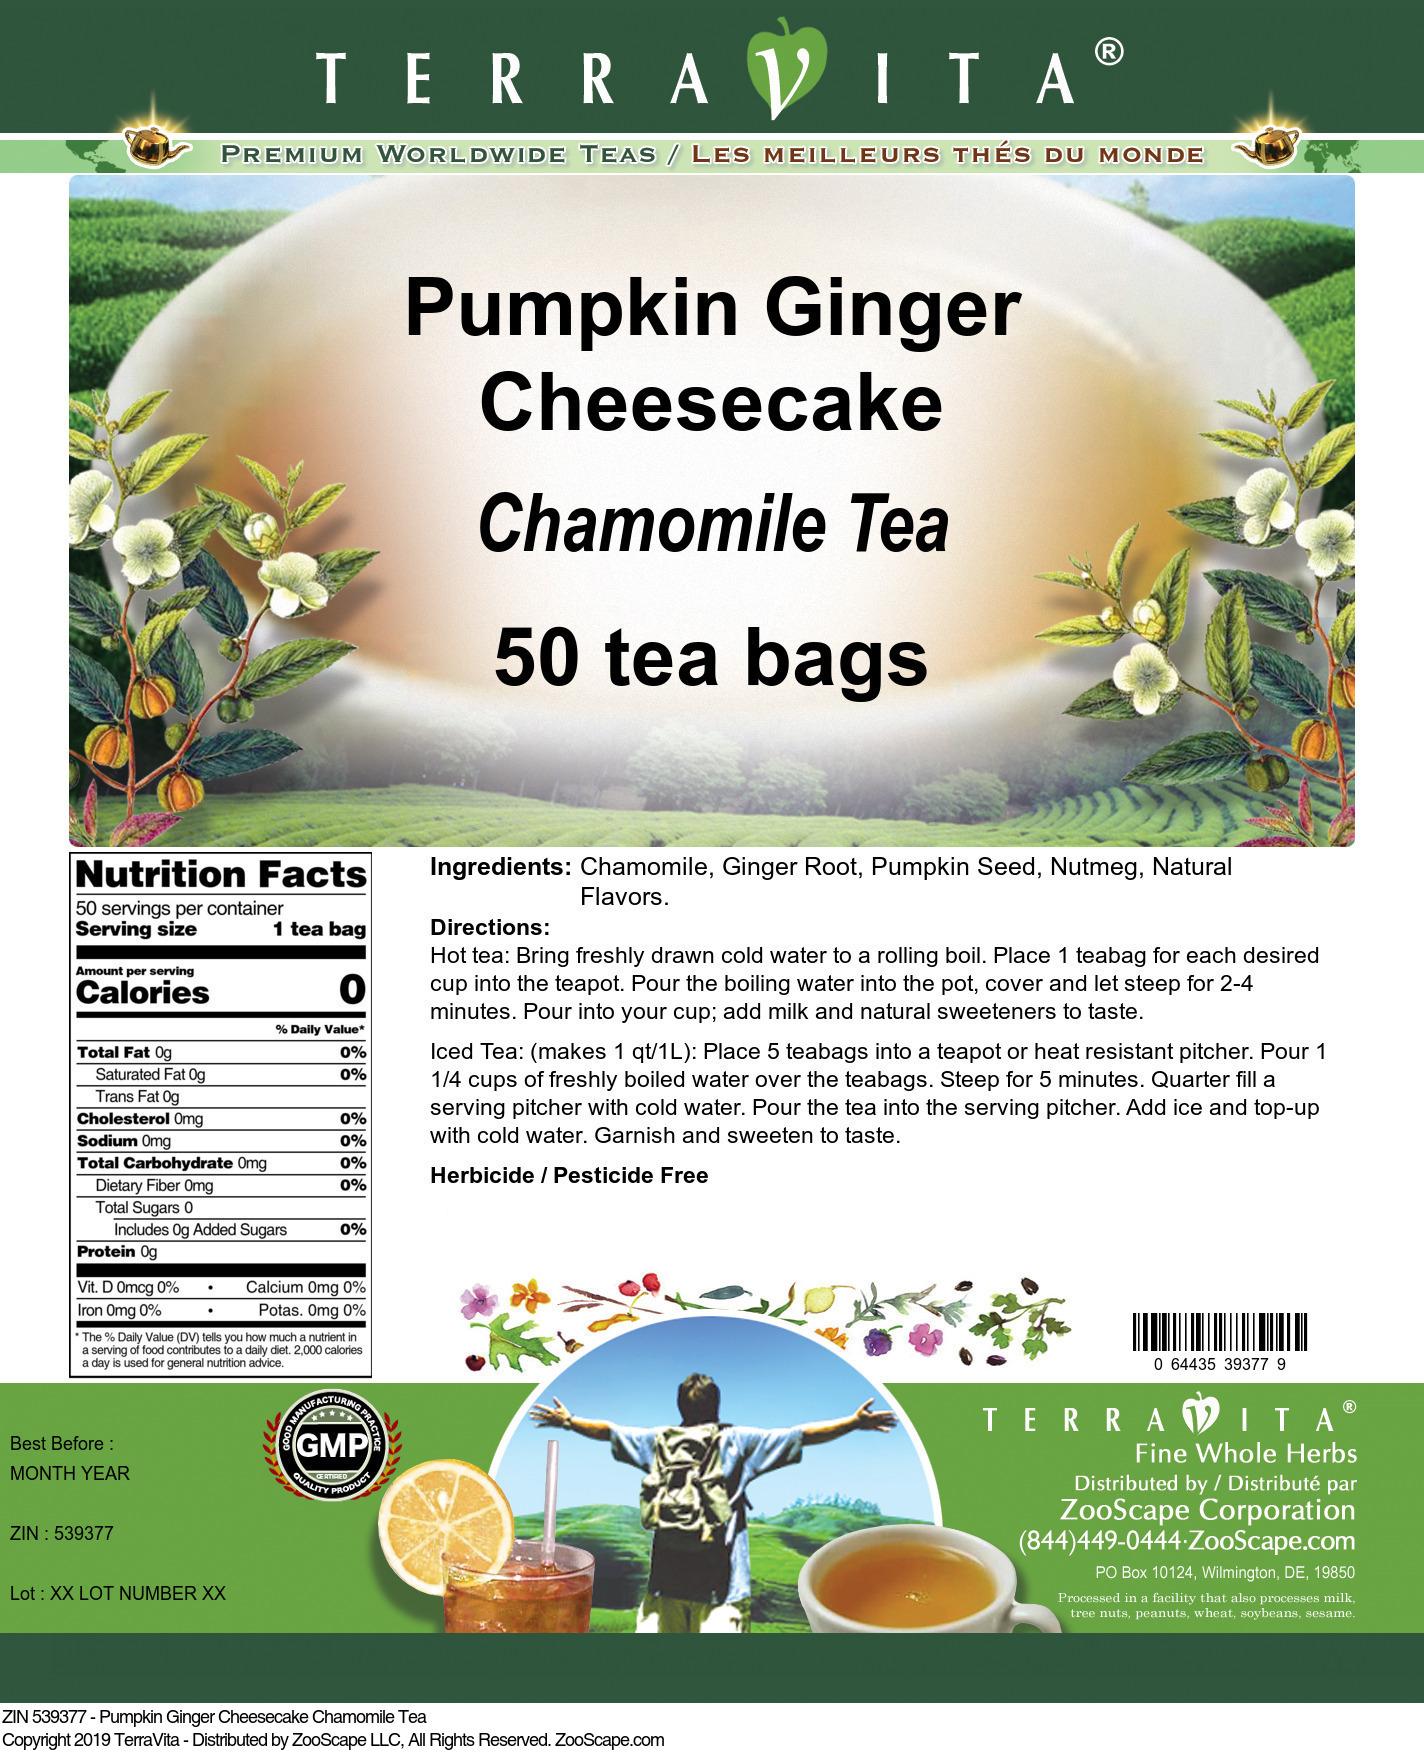 Pumpkin Ginger Cheesecake Chamomile Tea